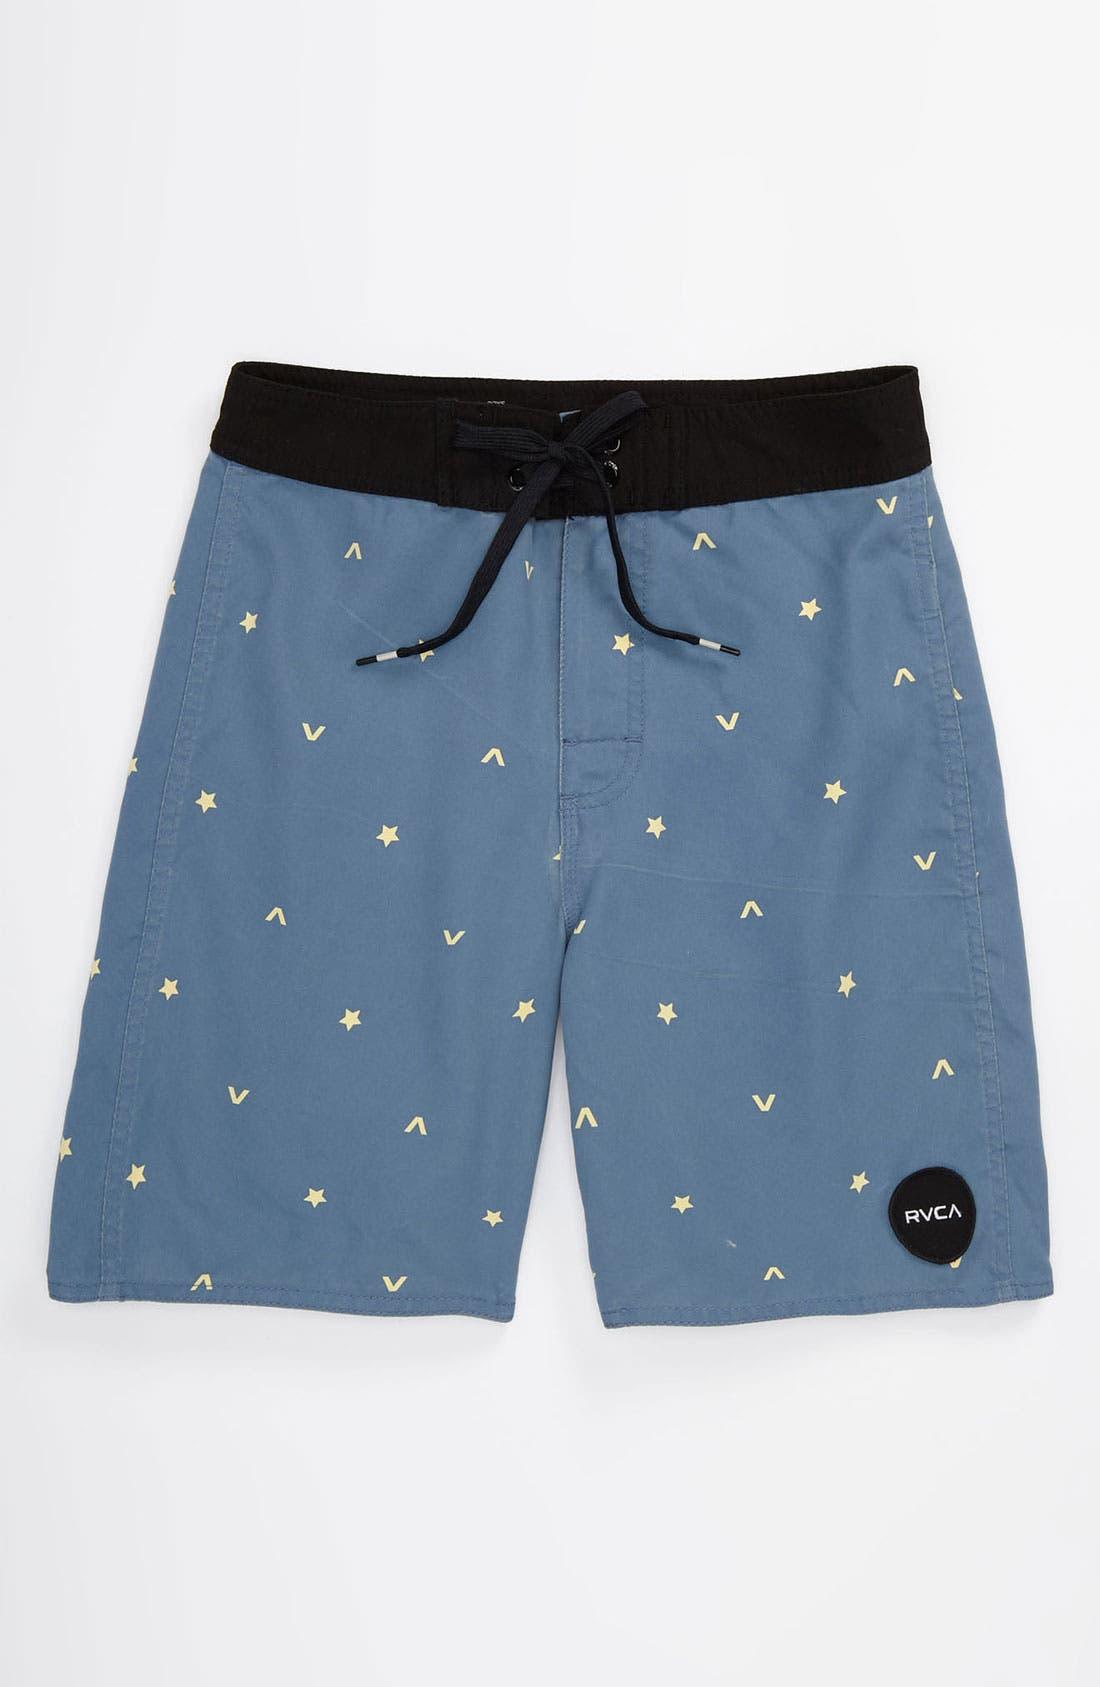 Main Image - RVCA 'Star' Swim Trunks (Big Boys)